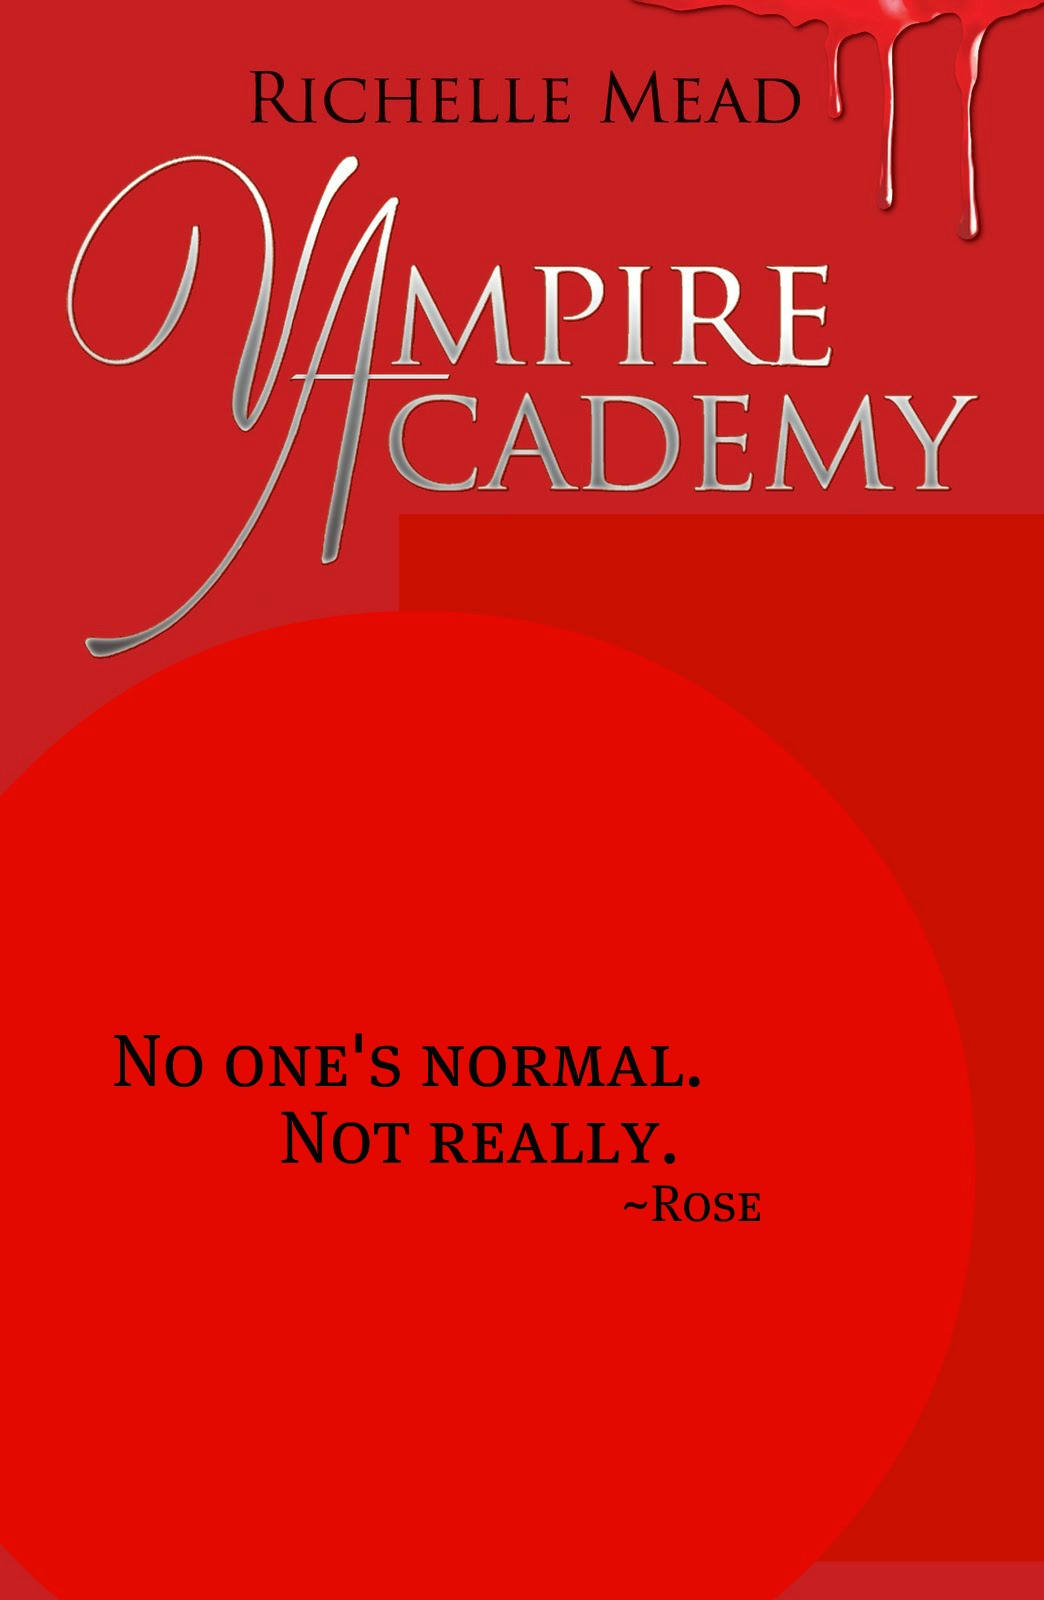 Vampire Love Quotes Wallpaper : Vampire Academy images Vampire Academy Quote HD wallpaper ...